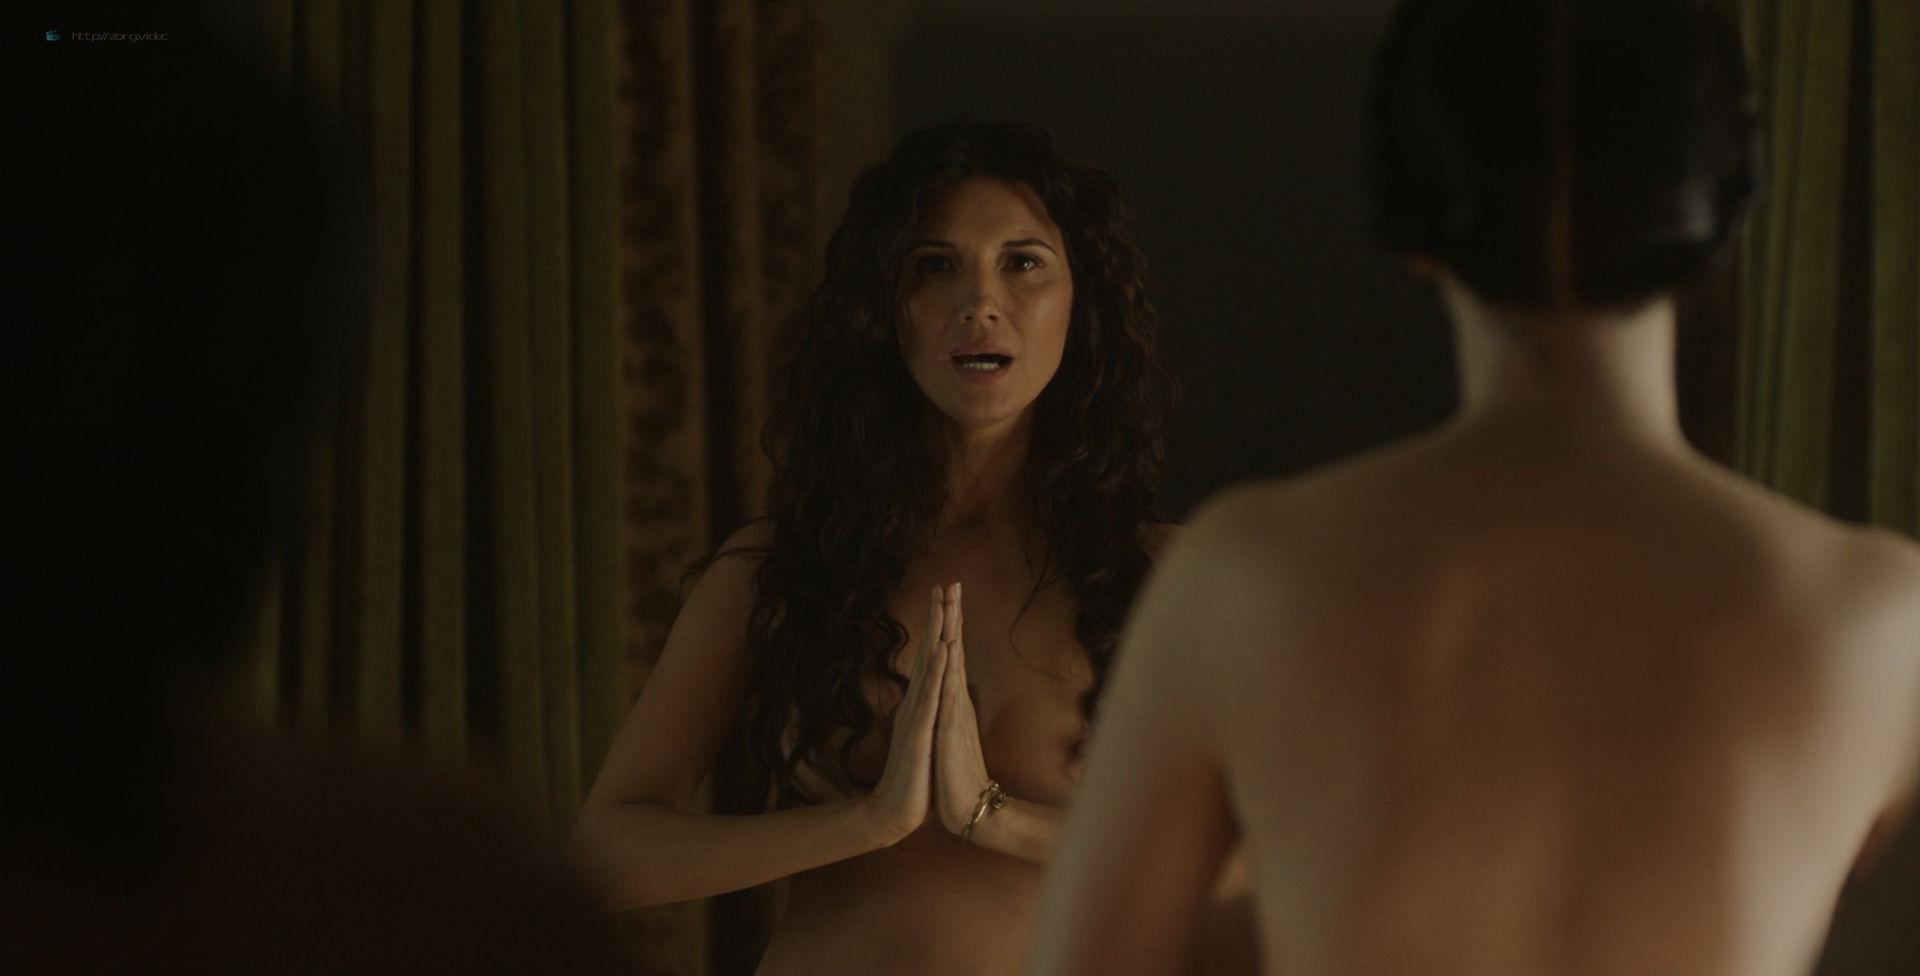 Amara Zaragoza nude topless Bella Heathcote hot orgy sex – Strange Angel (2018) s2e2 HD 1080p WEB (6)